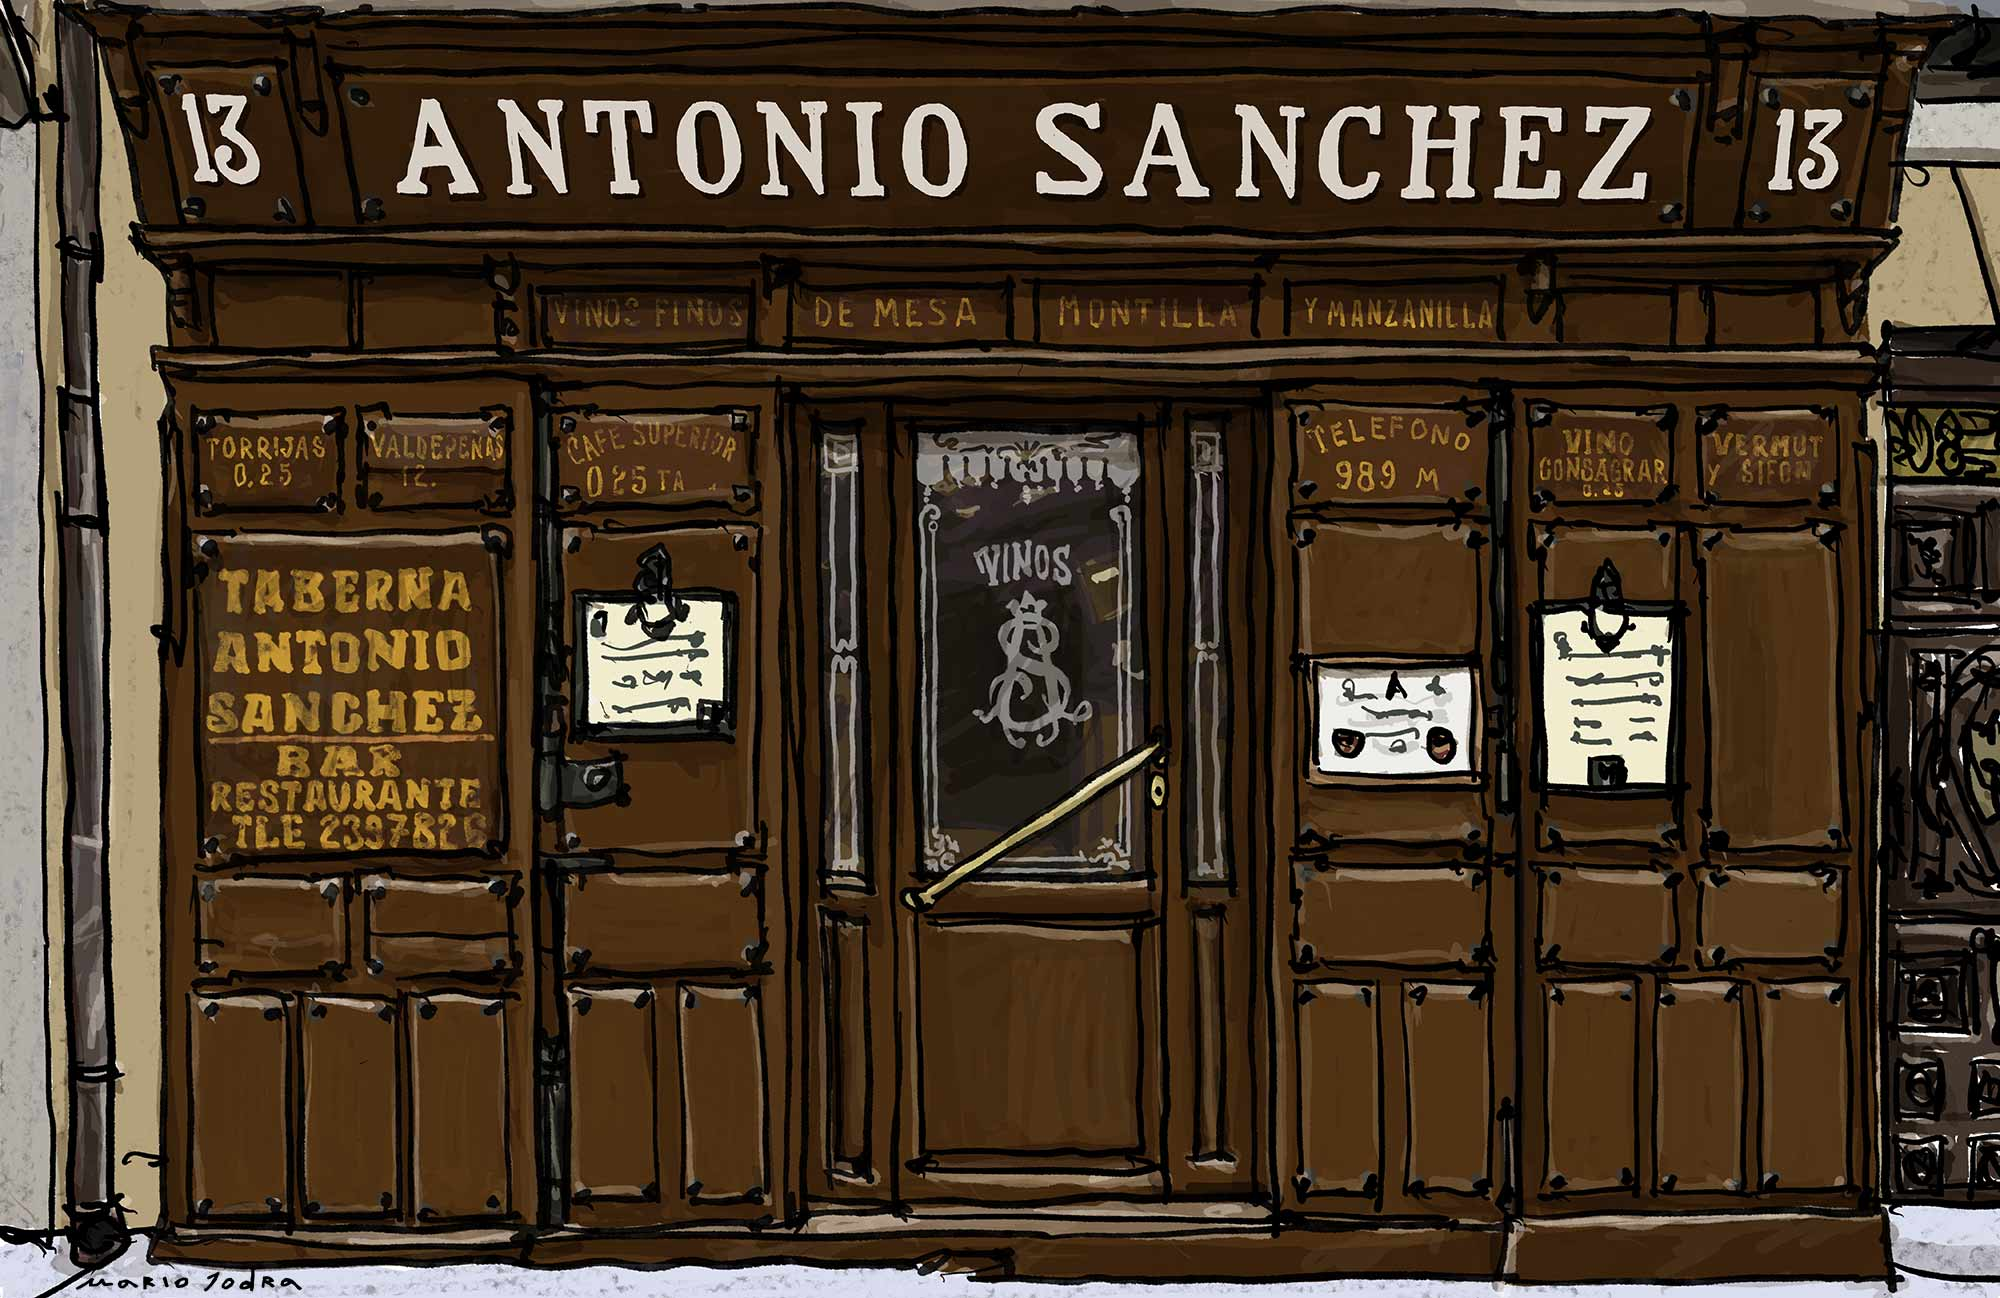 Mario Jodra illustration Art - Taberna de Antonio Sánchez- Madrid tavern. Since 1830